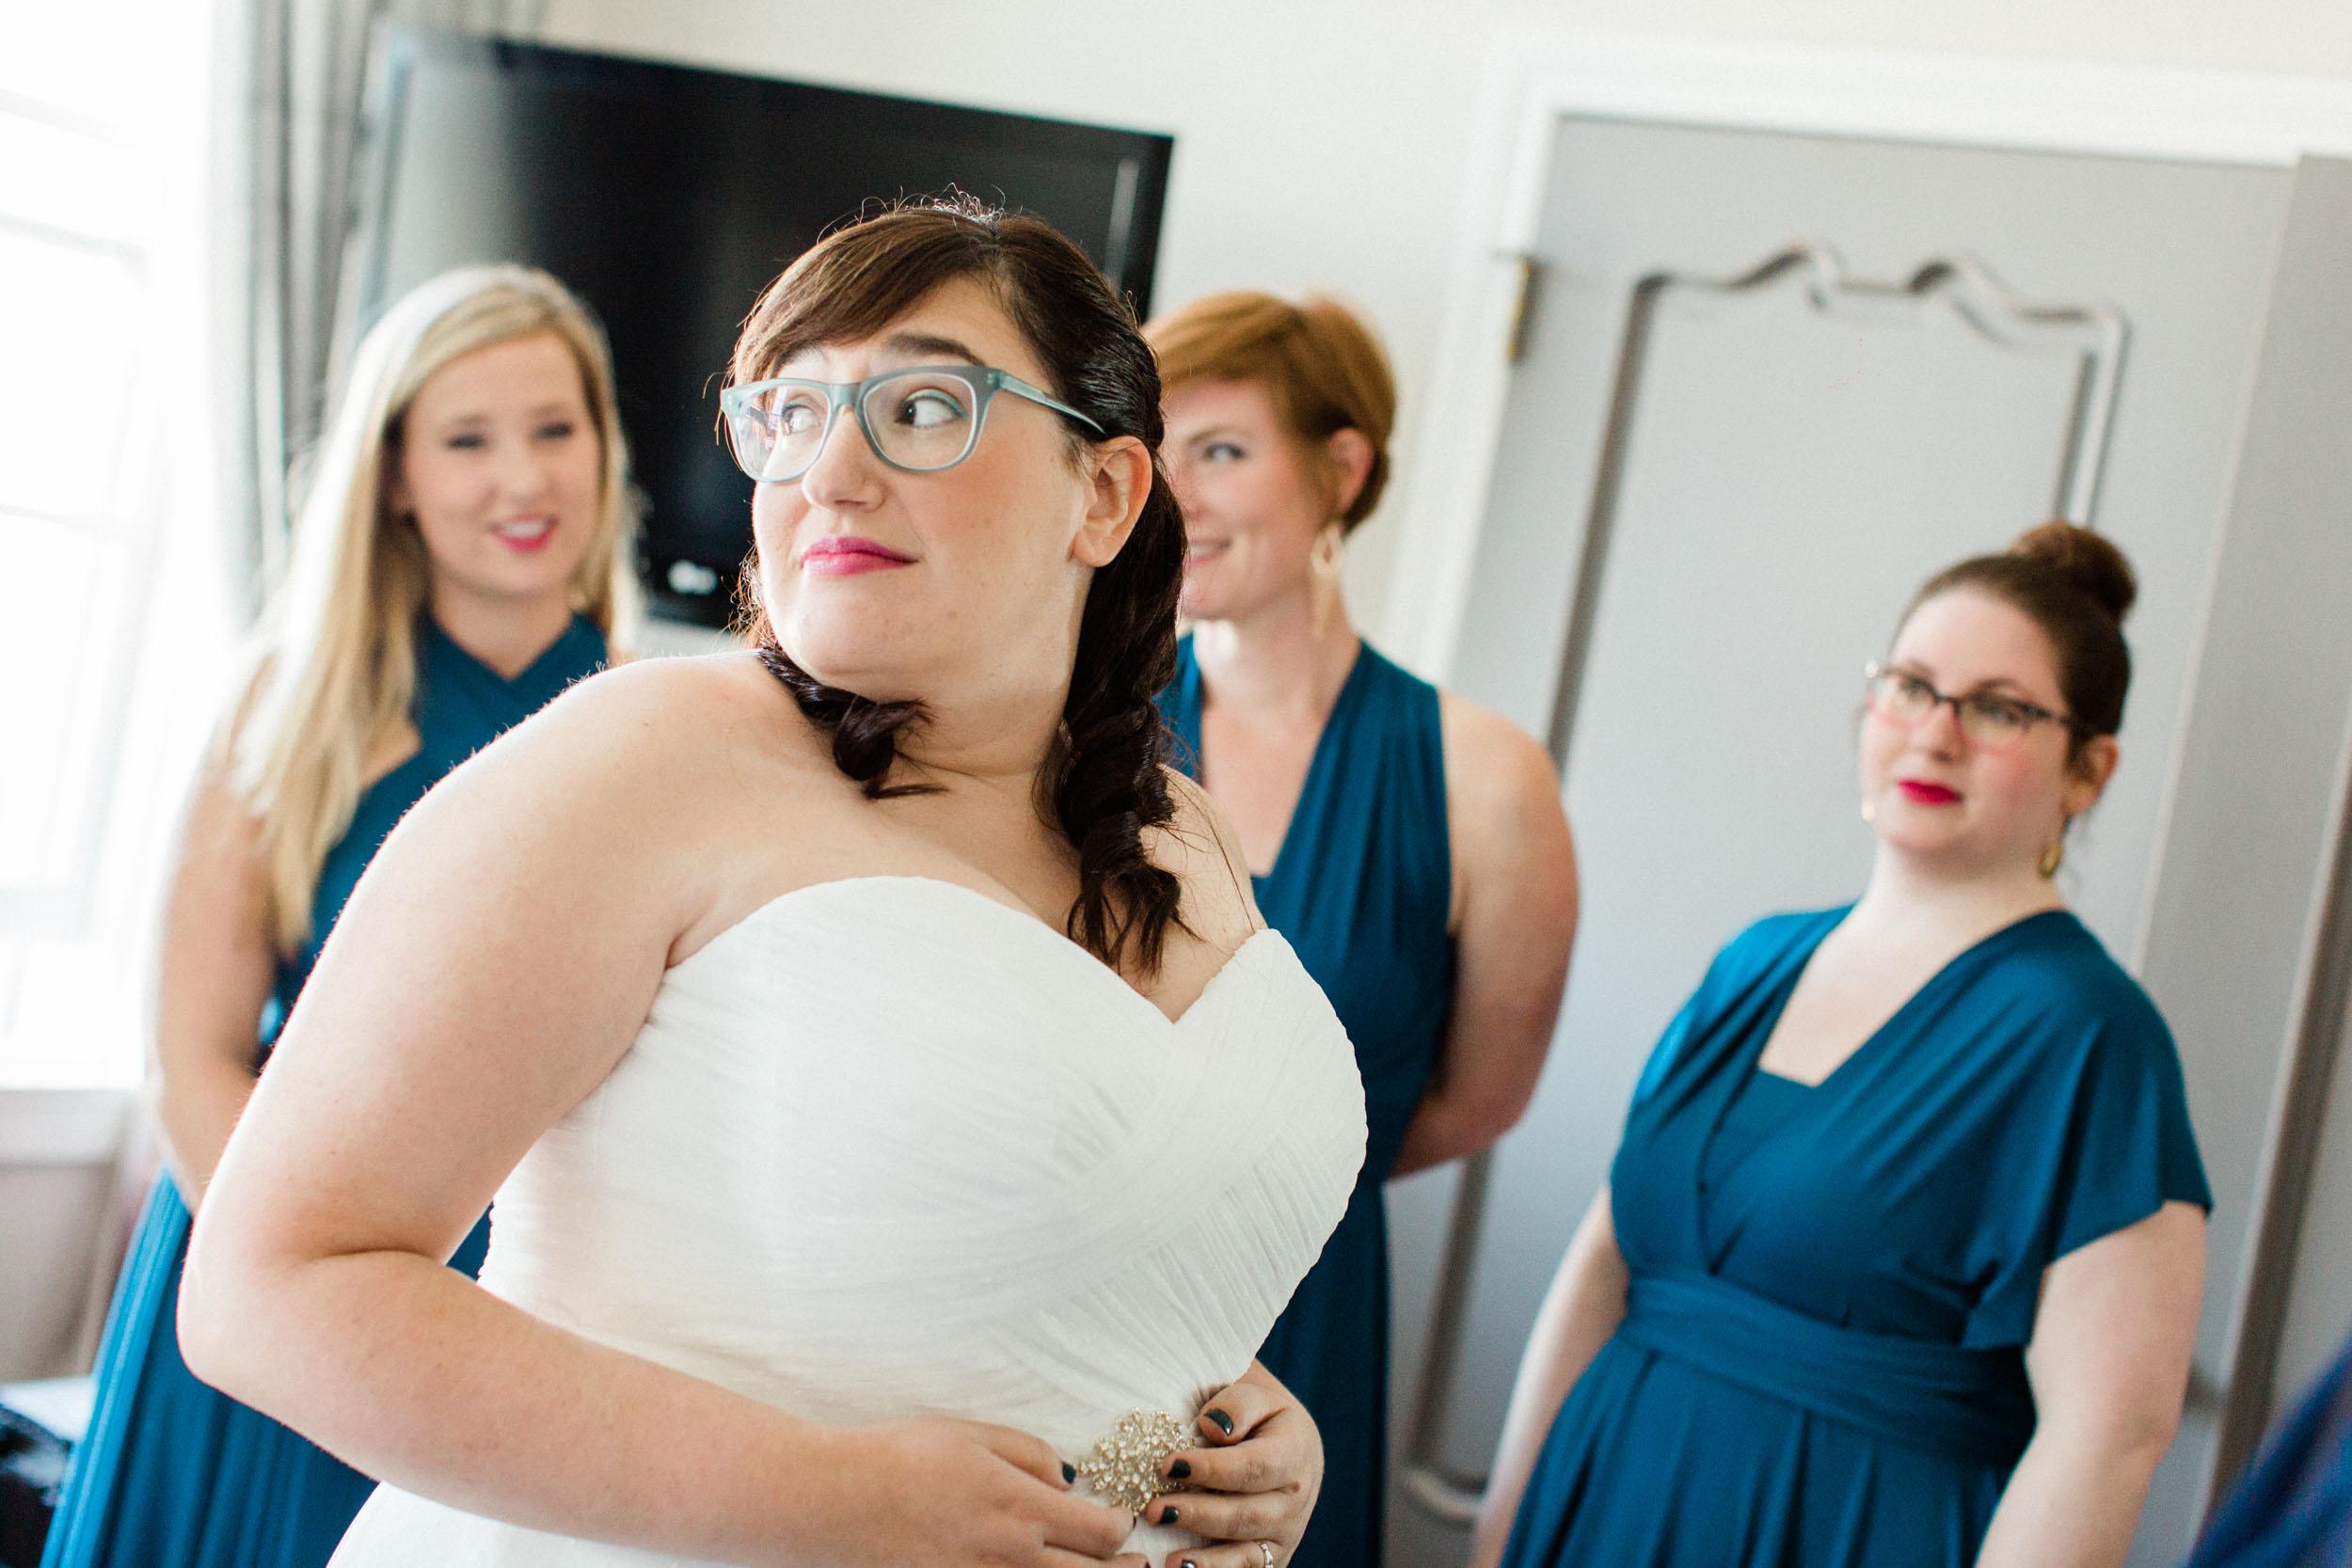 BKM-Photography-Smog-Shoppe-Culver-City-Wedding-Photographer-Culver-Hotel-0013.jpg